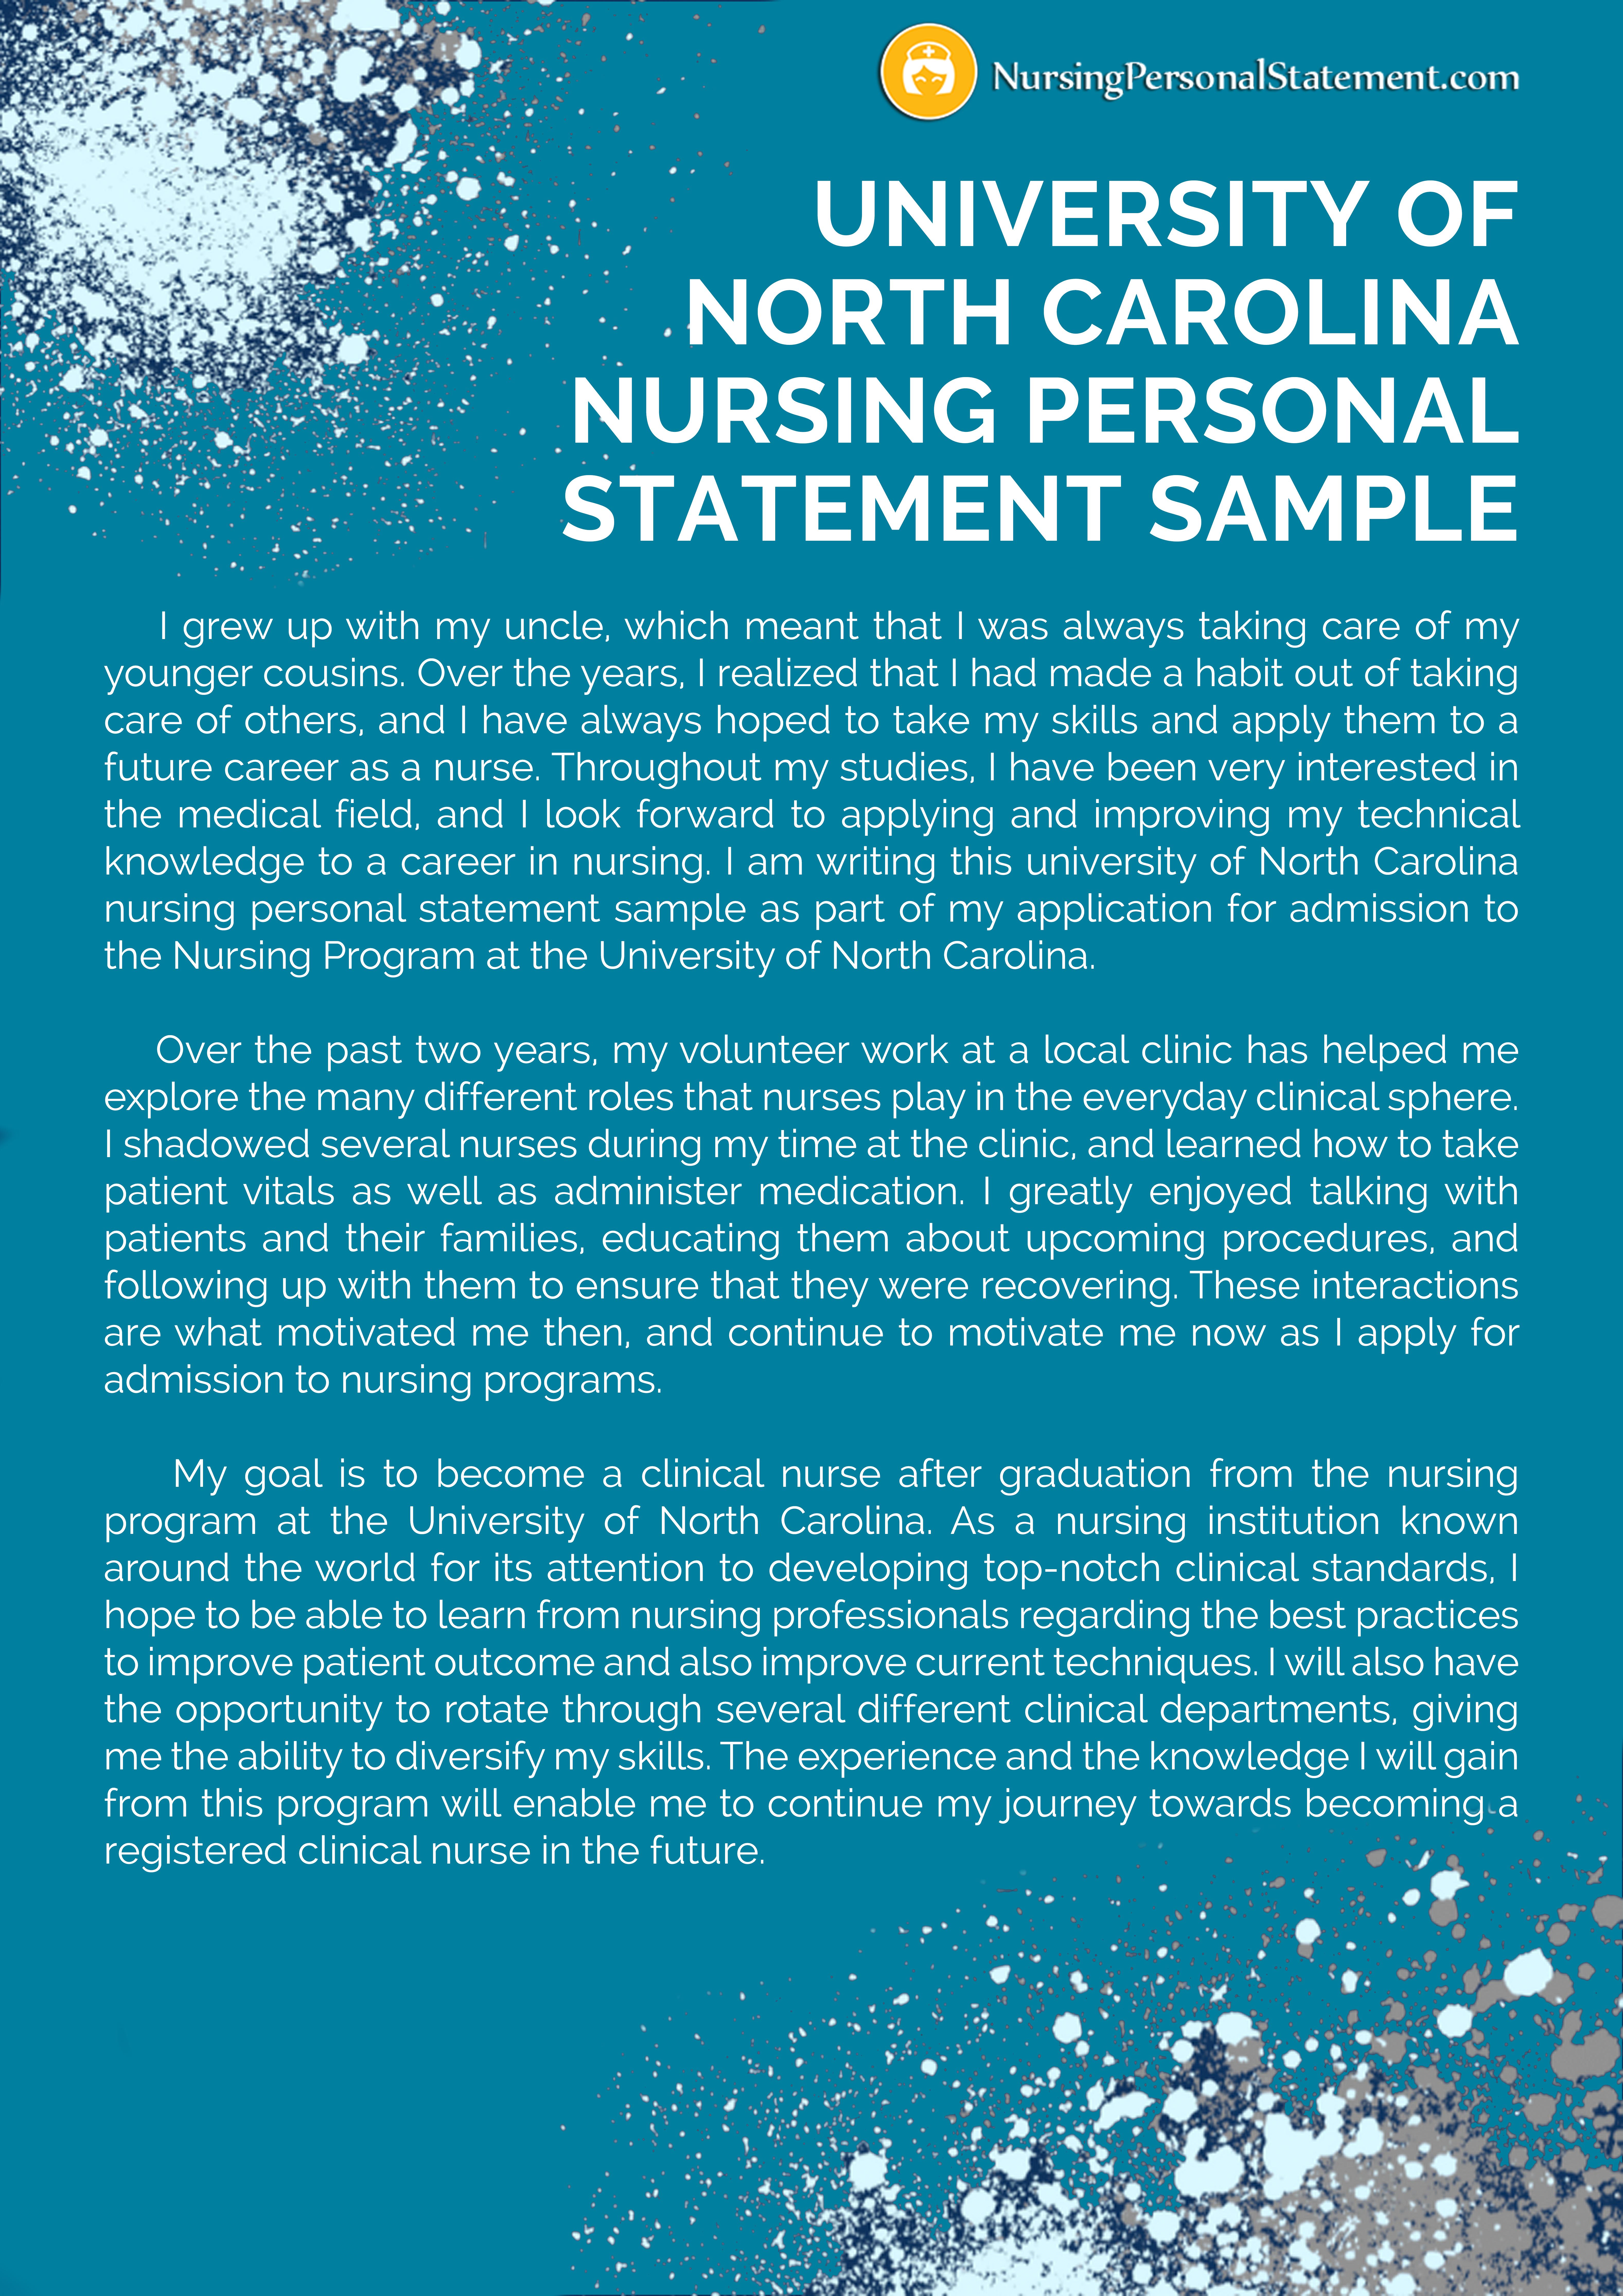 University Of North Carolina Nursing Personal Statement Sample Nurse American Law